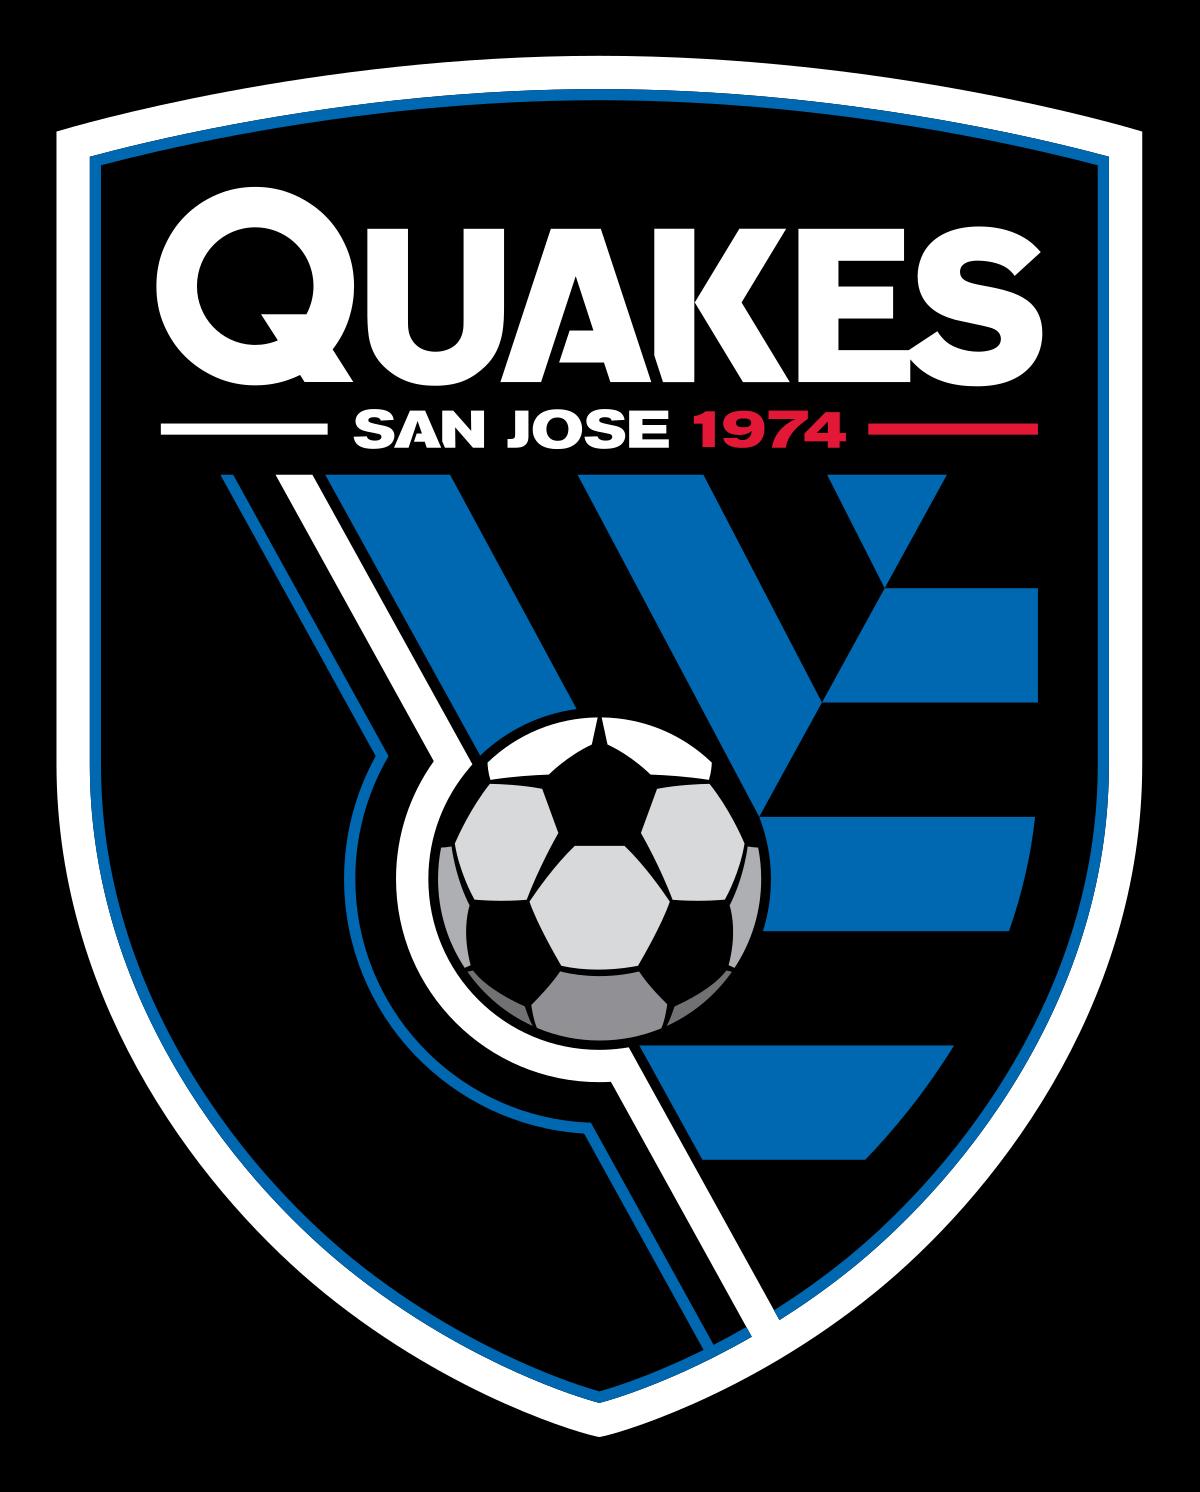 San Jose Earthquakes.